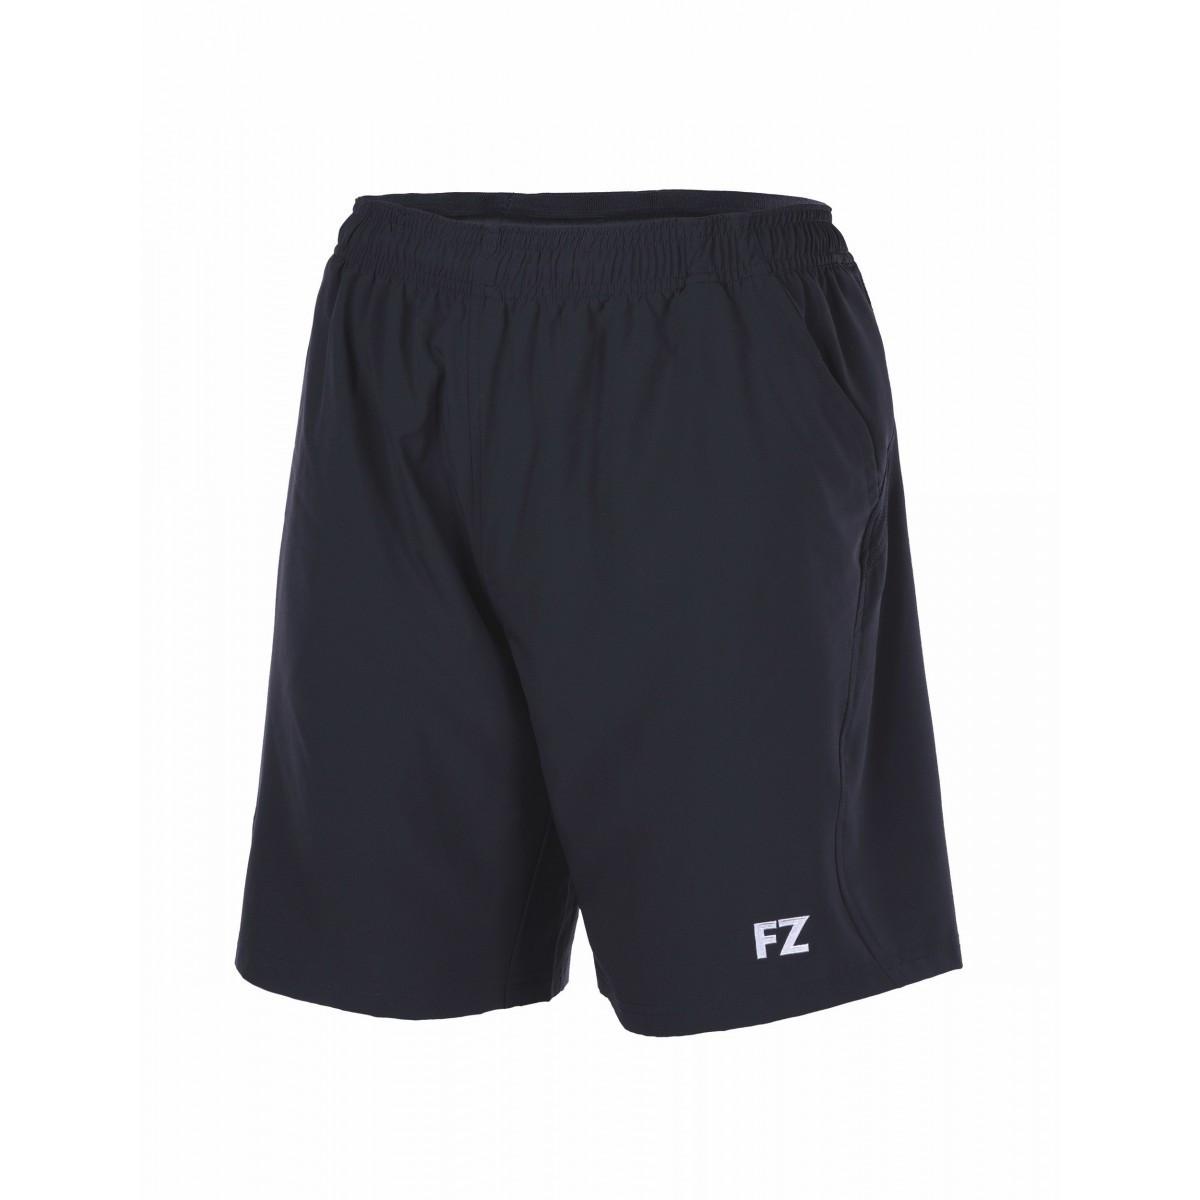 Спортивные шорты FZ FORZA Ajax Junior Shorts Black